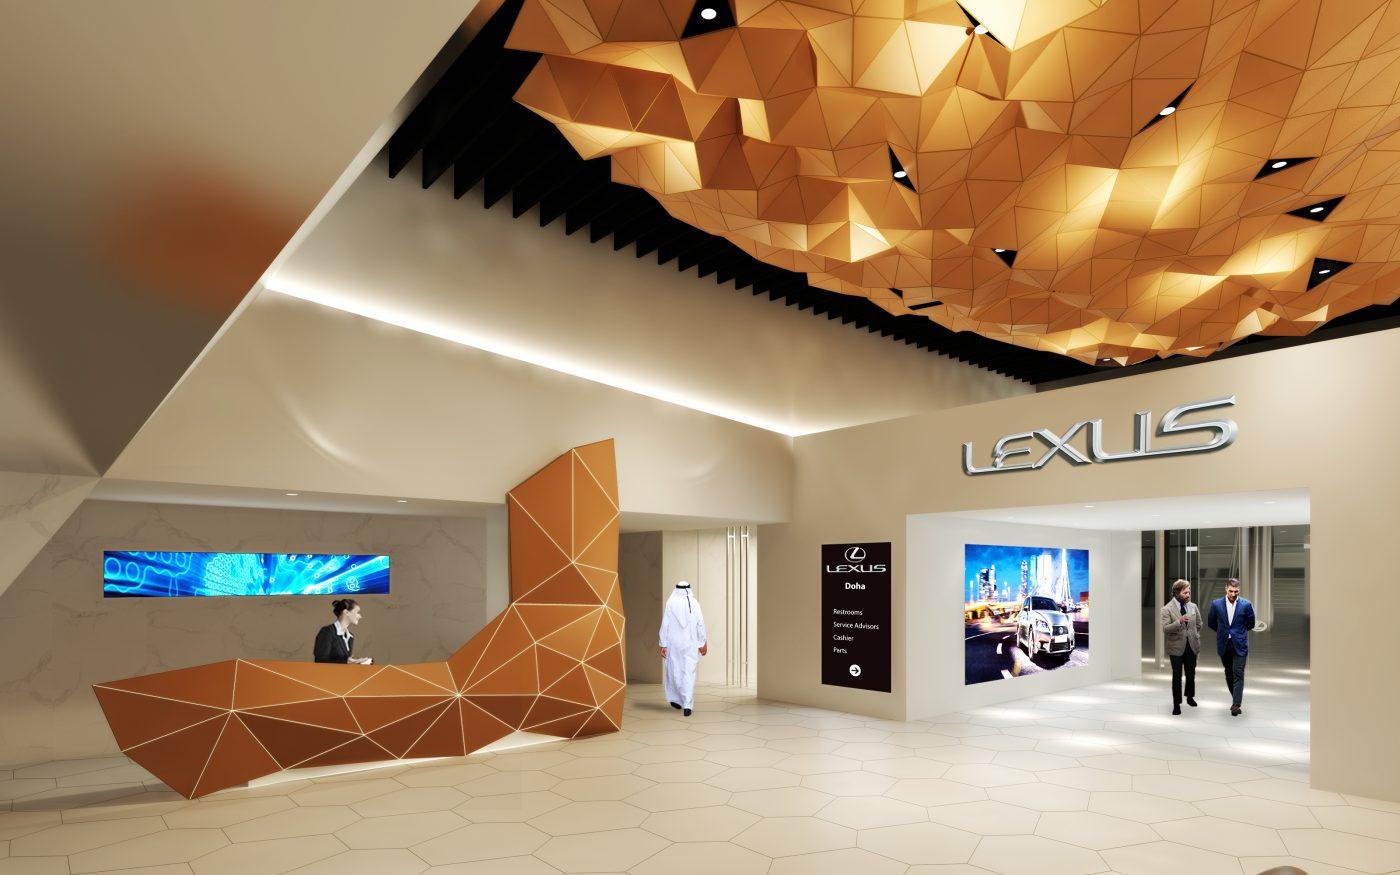 Garden City Jeep >> Lexus showroom and offices - Doha - Peia Associati